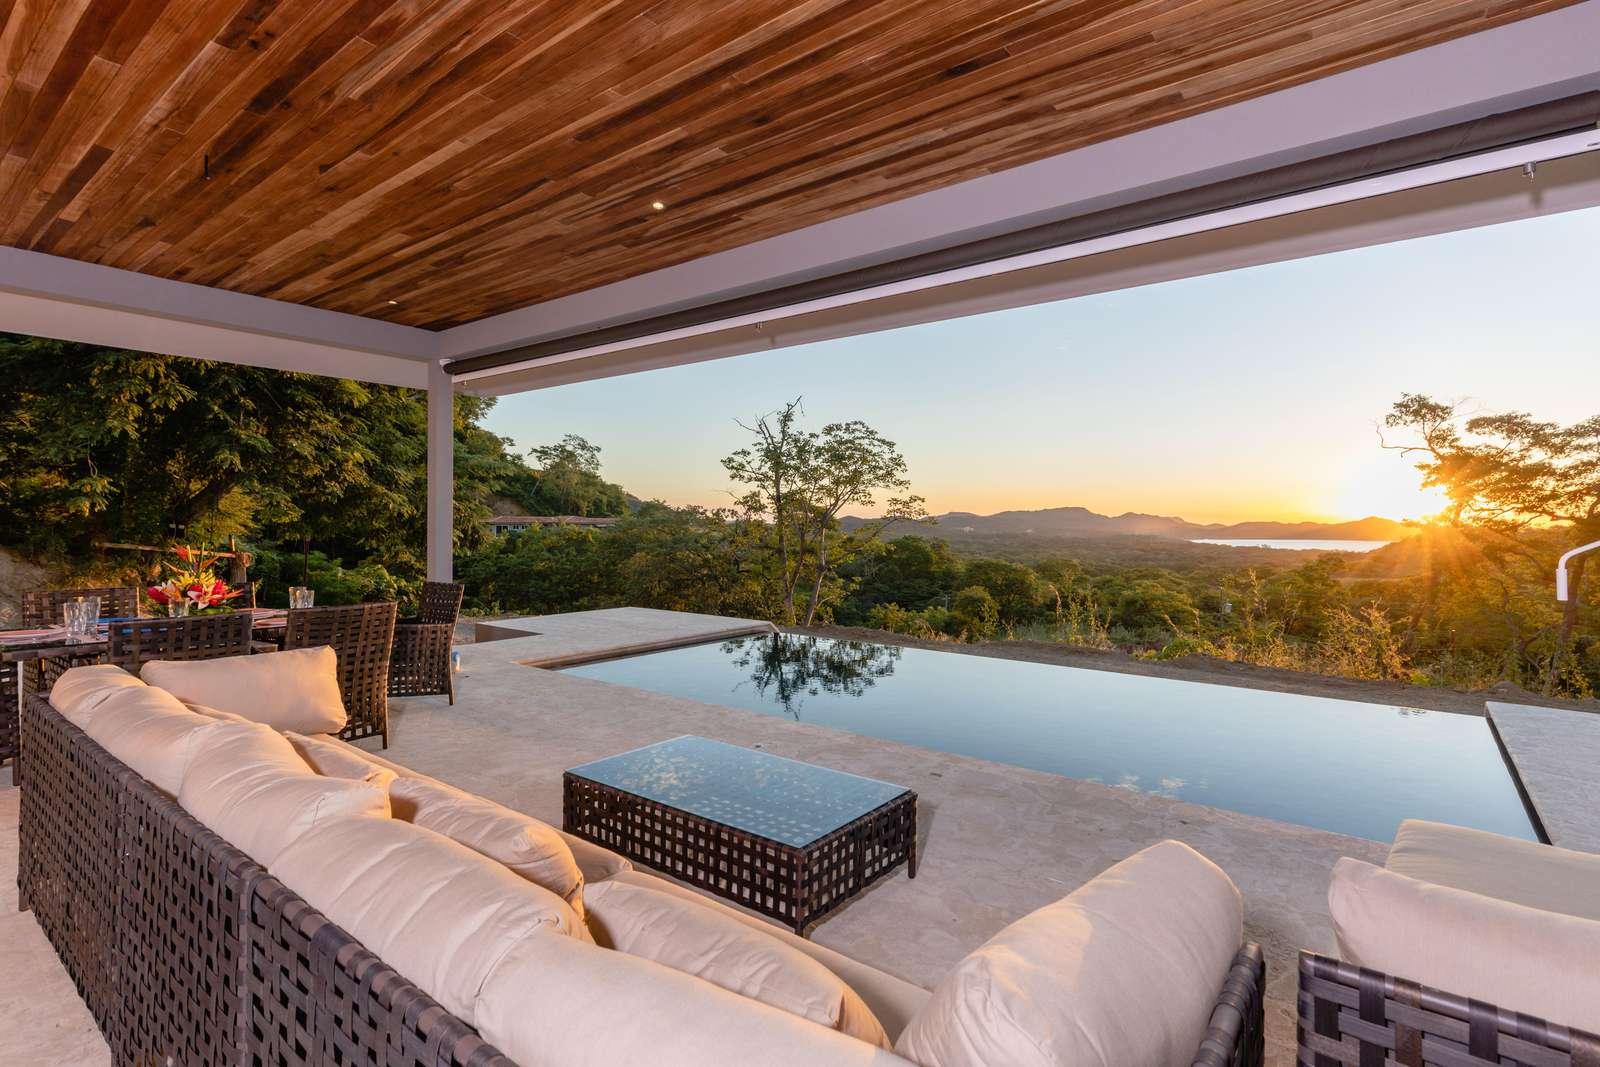 Miramar 30, ocean views, covered terrace - property